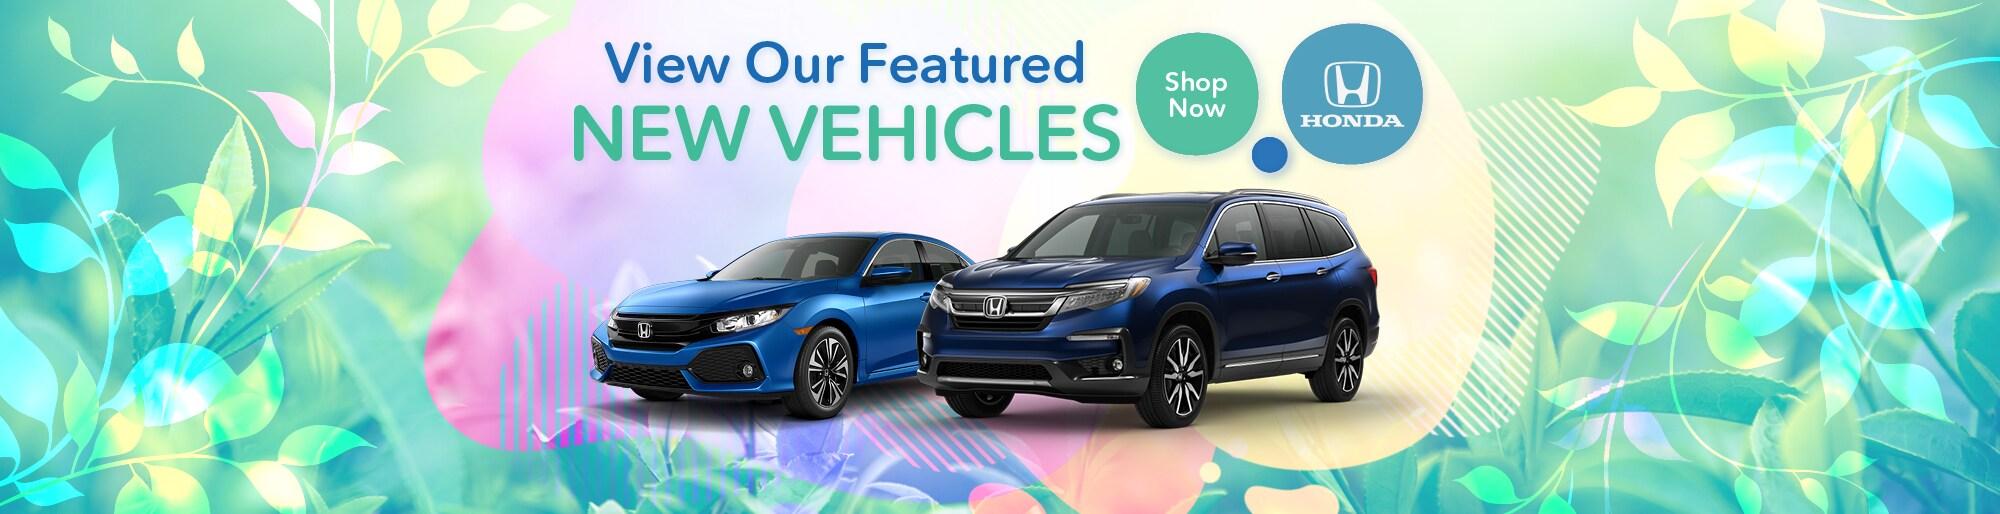 Honda Dealership Orange County >> New 2019 Honda Used Car Dealer In Pompton Plains Nj Route 23 Honda